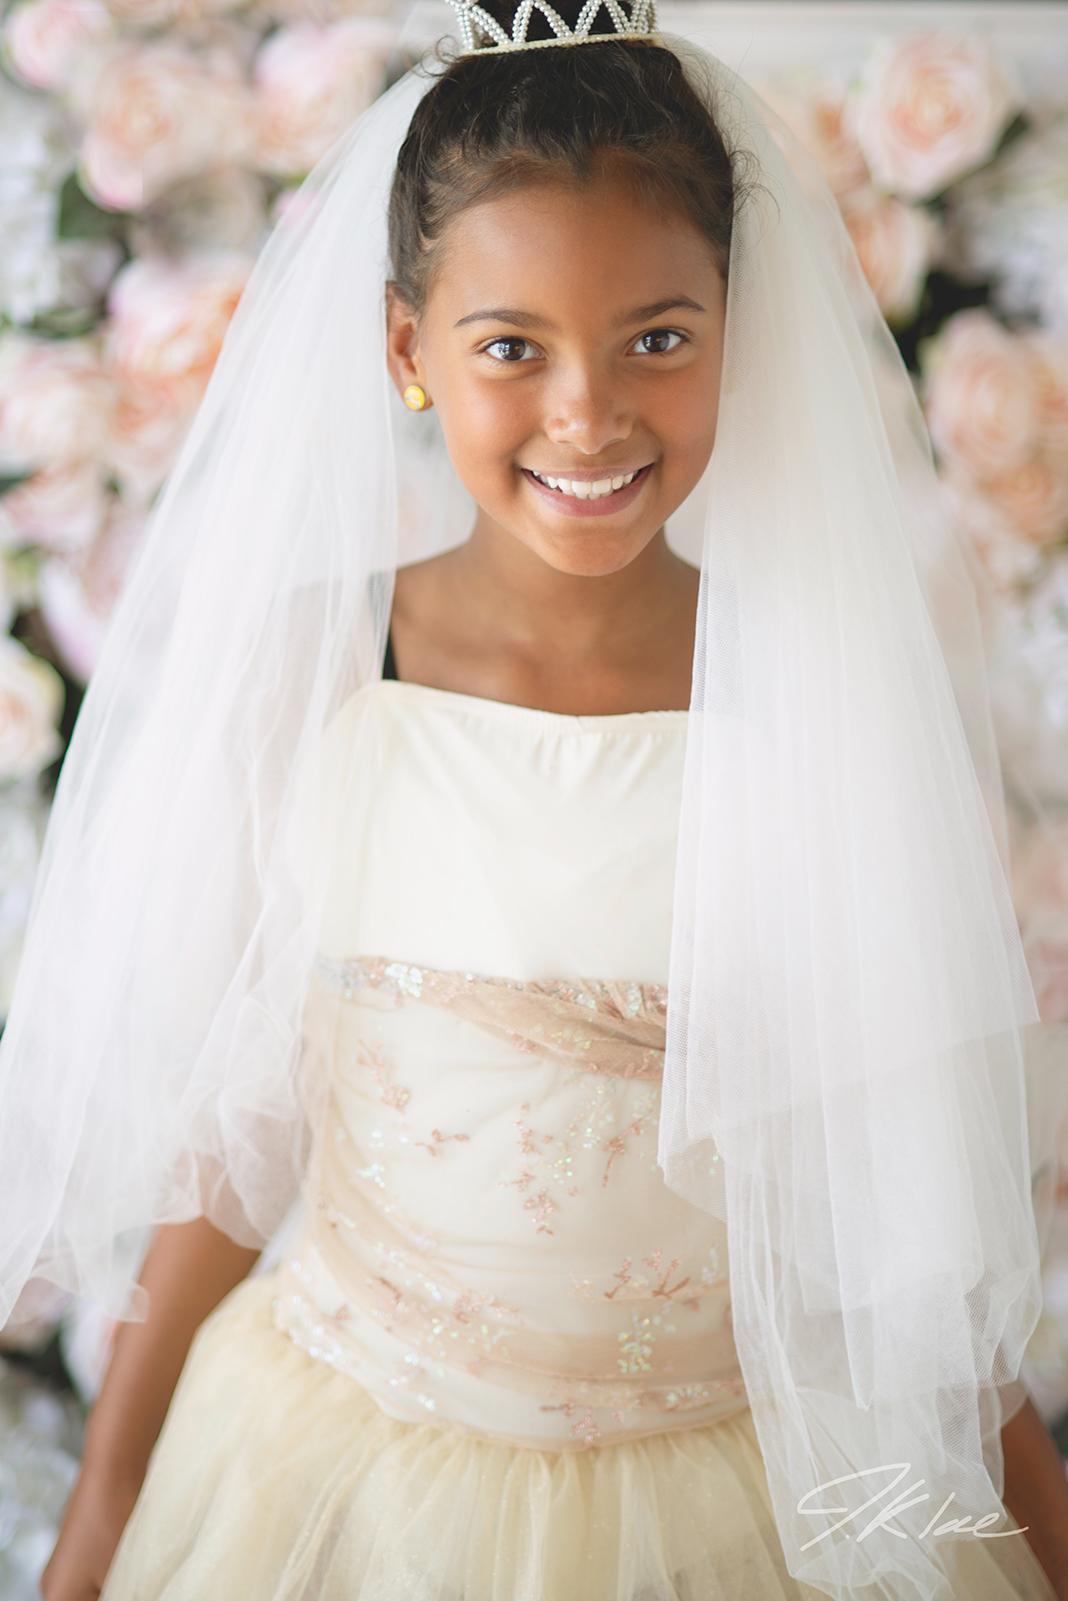 Princess images of girl with tiara, veil, and beautiful dress in Frisco Texas